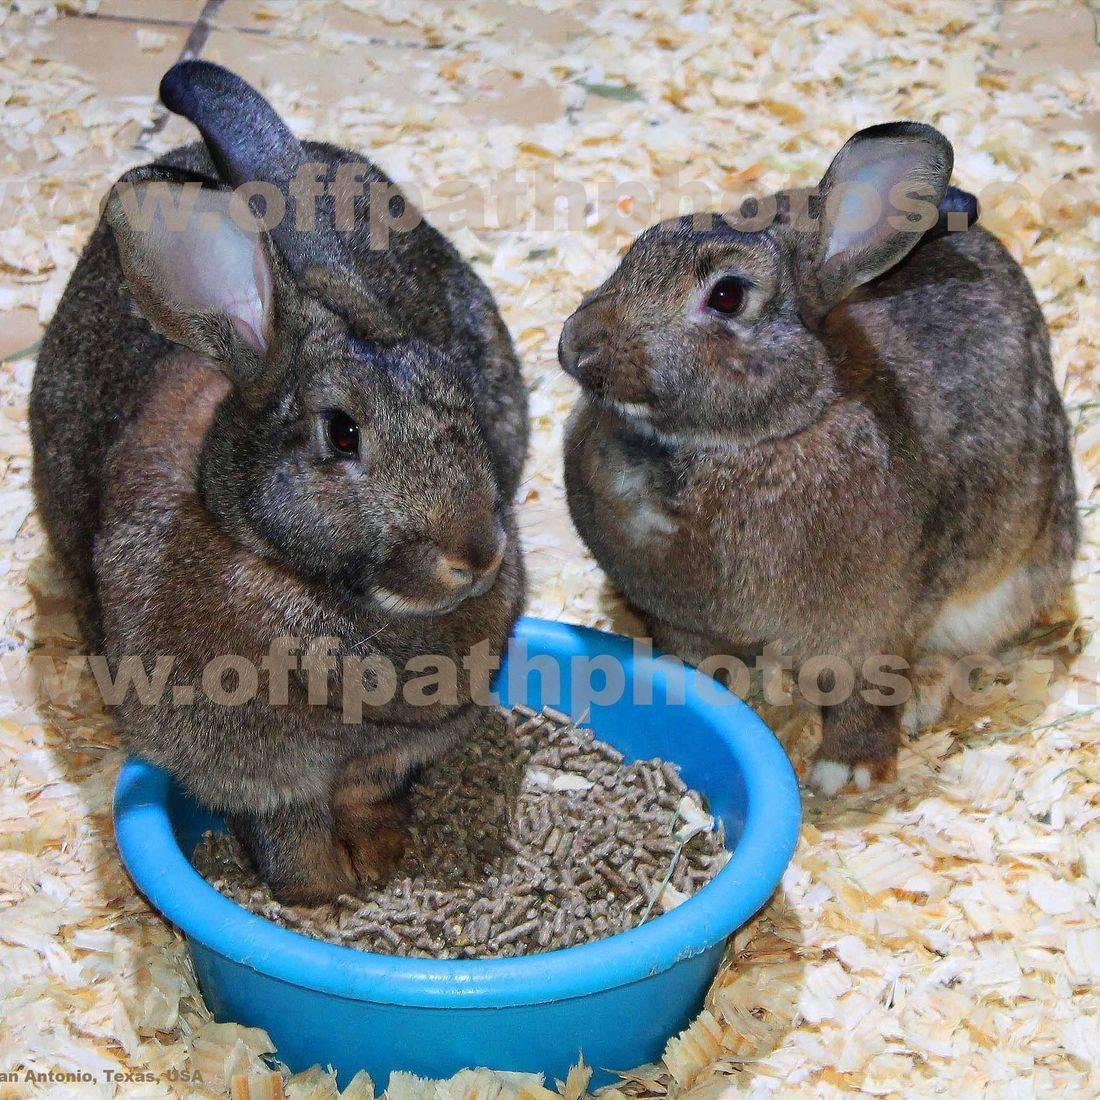 photography, animals, farm, pets, rabbits, feeding, bunny, cute, zoo, cuddly